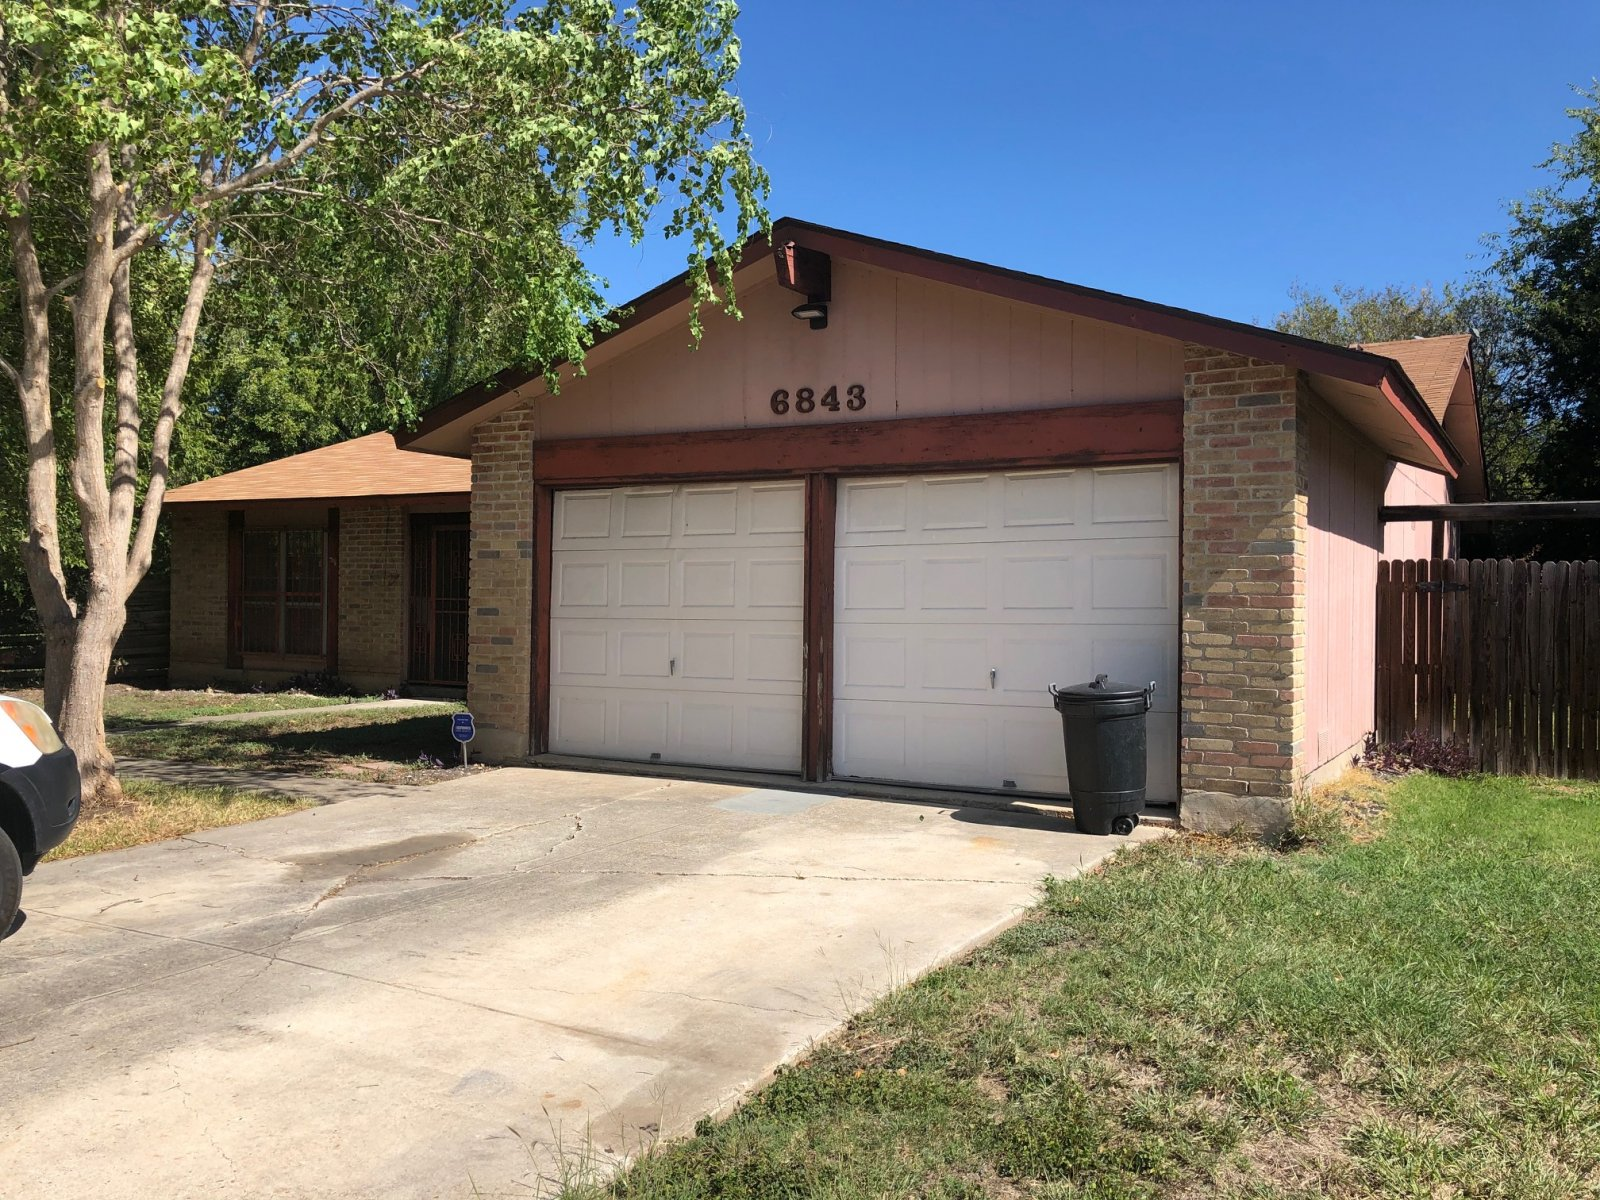 6843 Laguna Norte - Wholesale Deal in San Antonio, TX